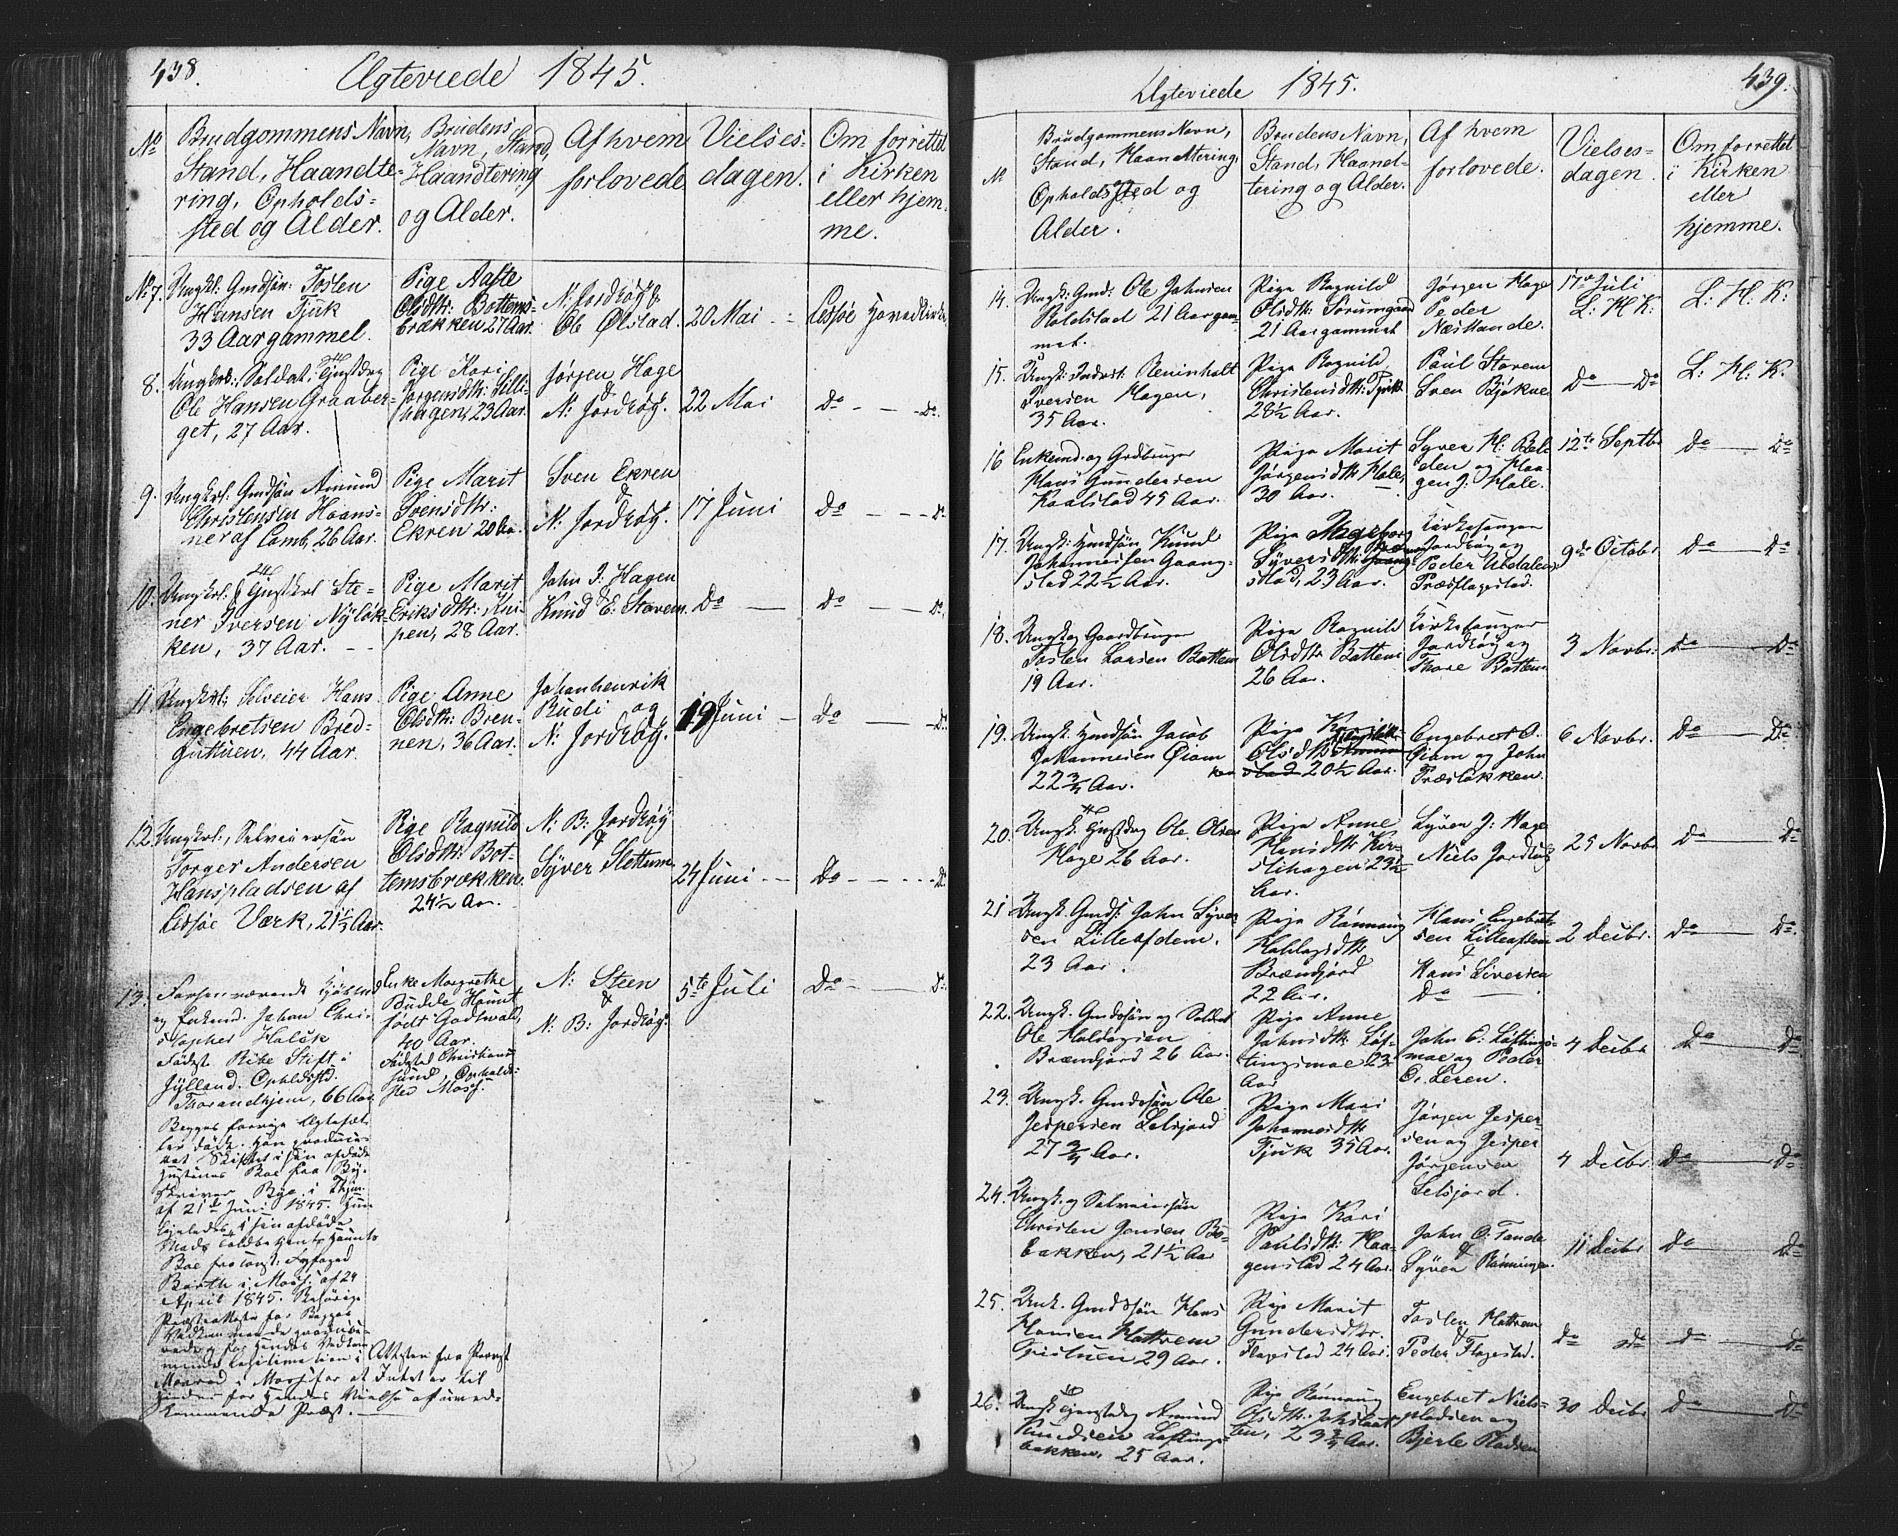 SAH, Lesja prestekontor, Klokkerbok nr. 2, 1832-1850, s. 438-439